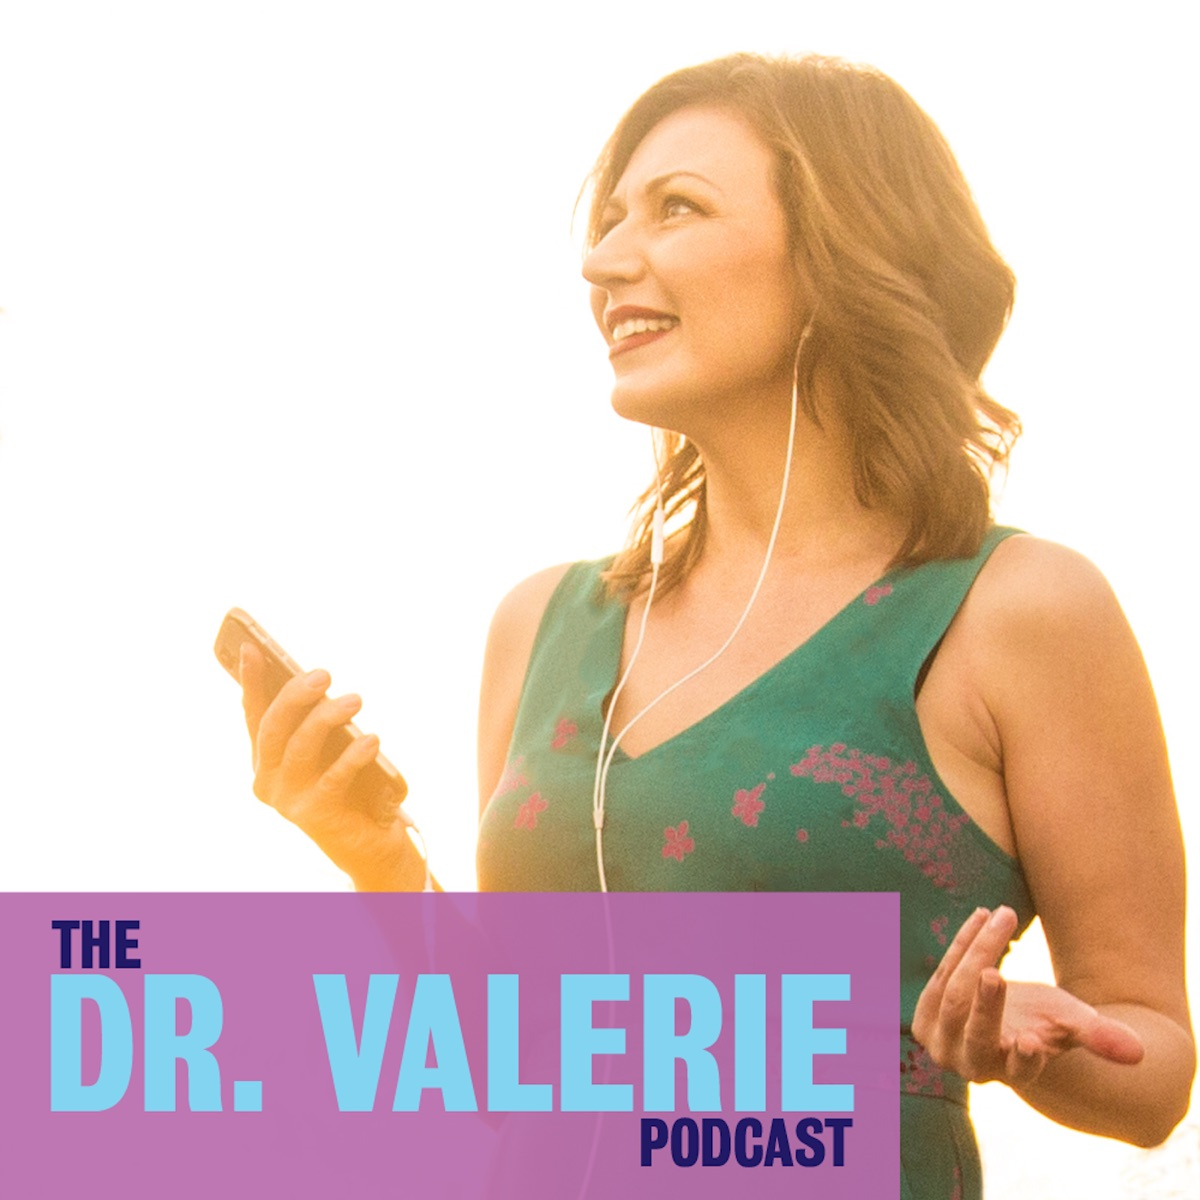 The Dr. Valerie Podcast